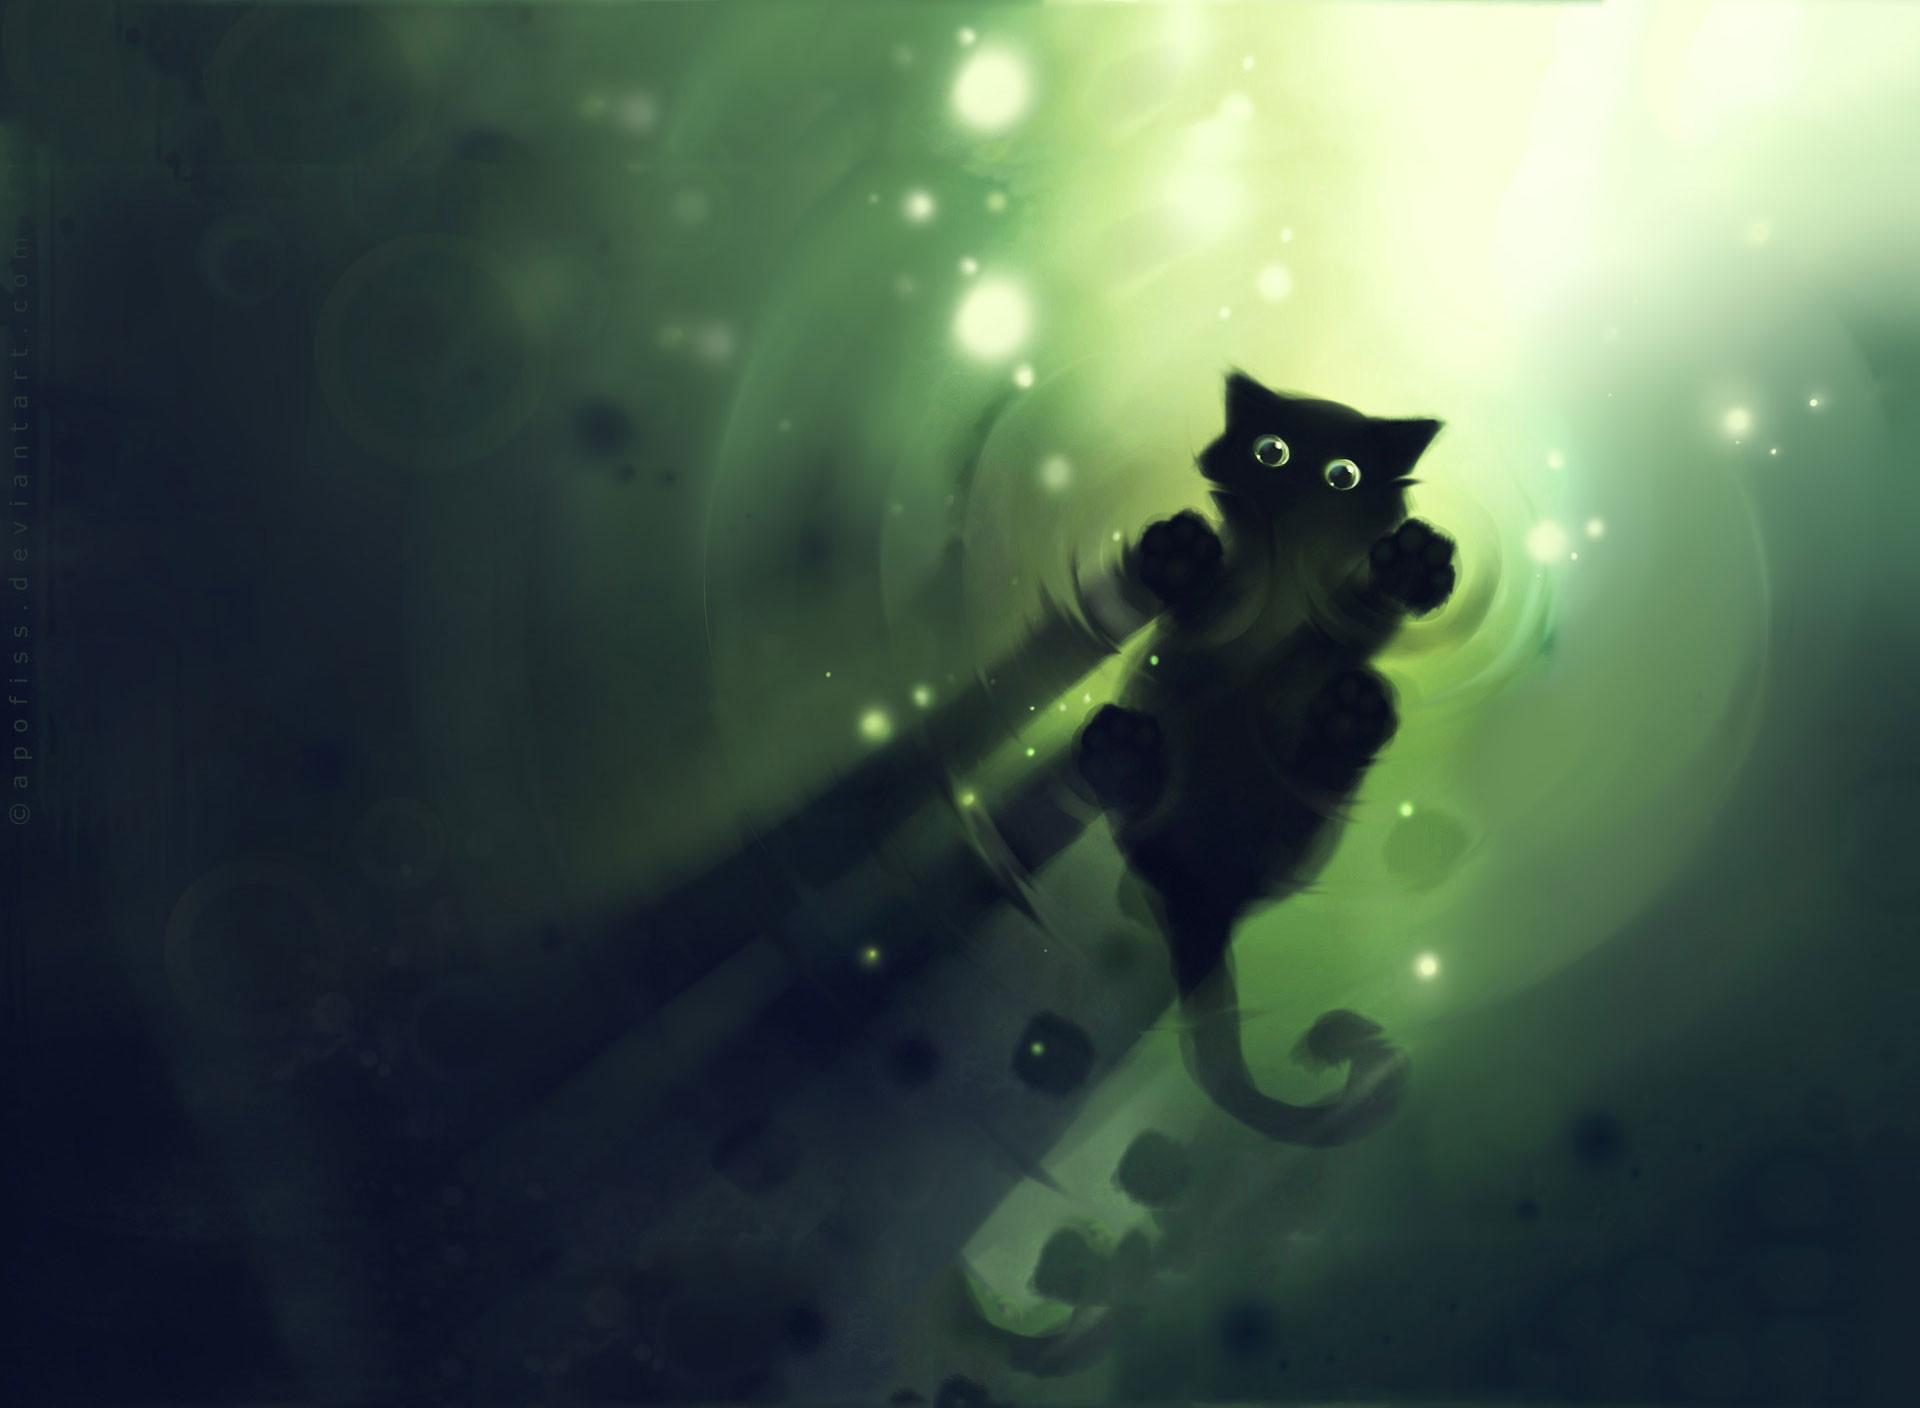 Abstract Kitten wallpaper